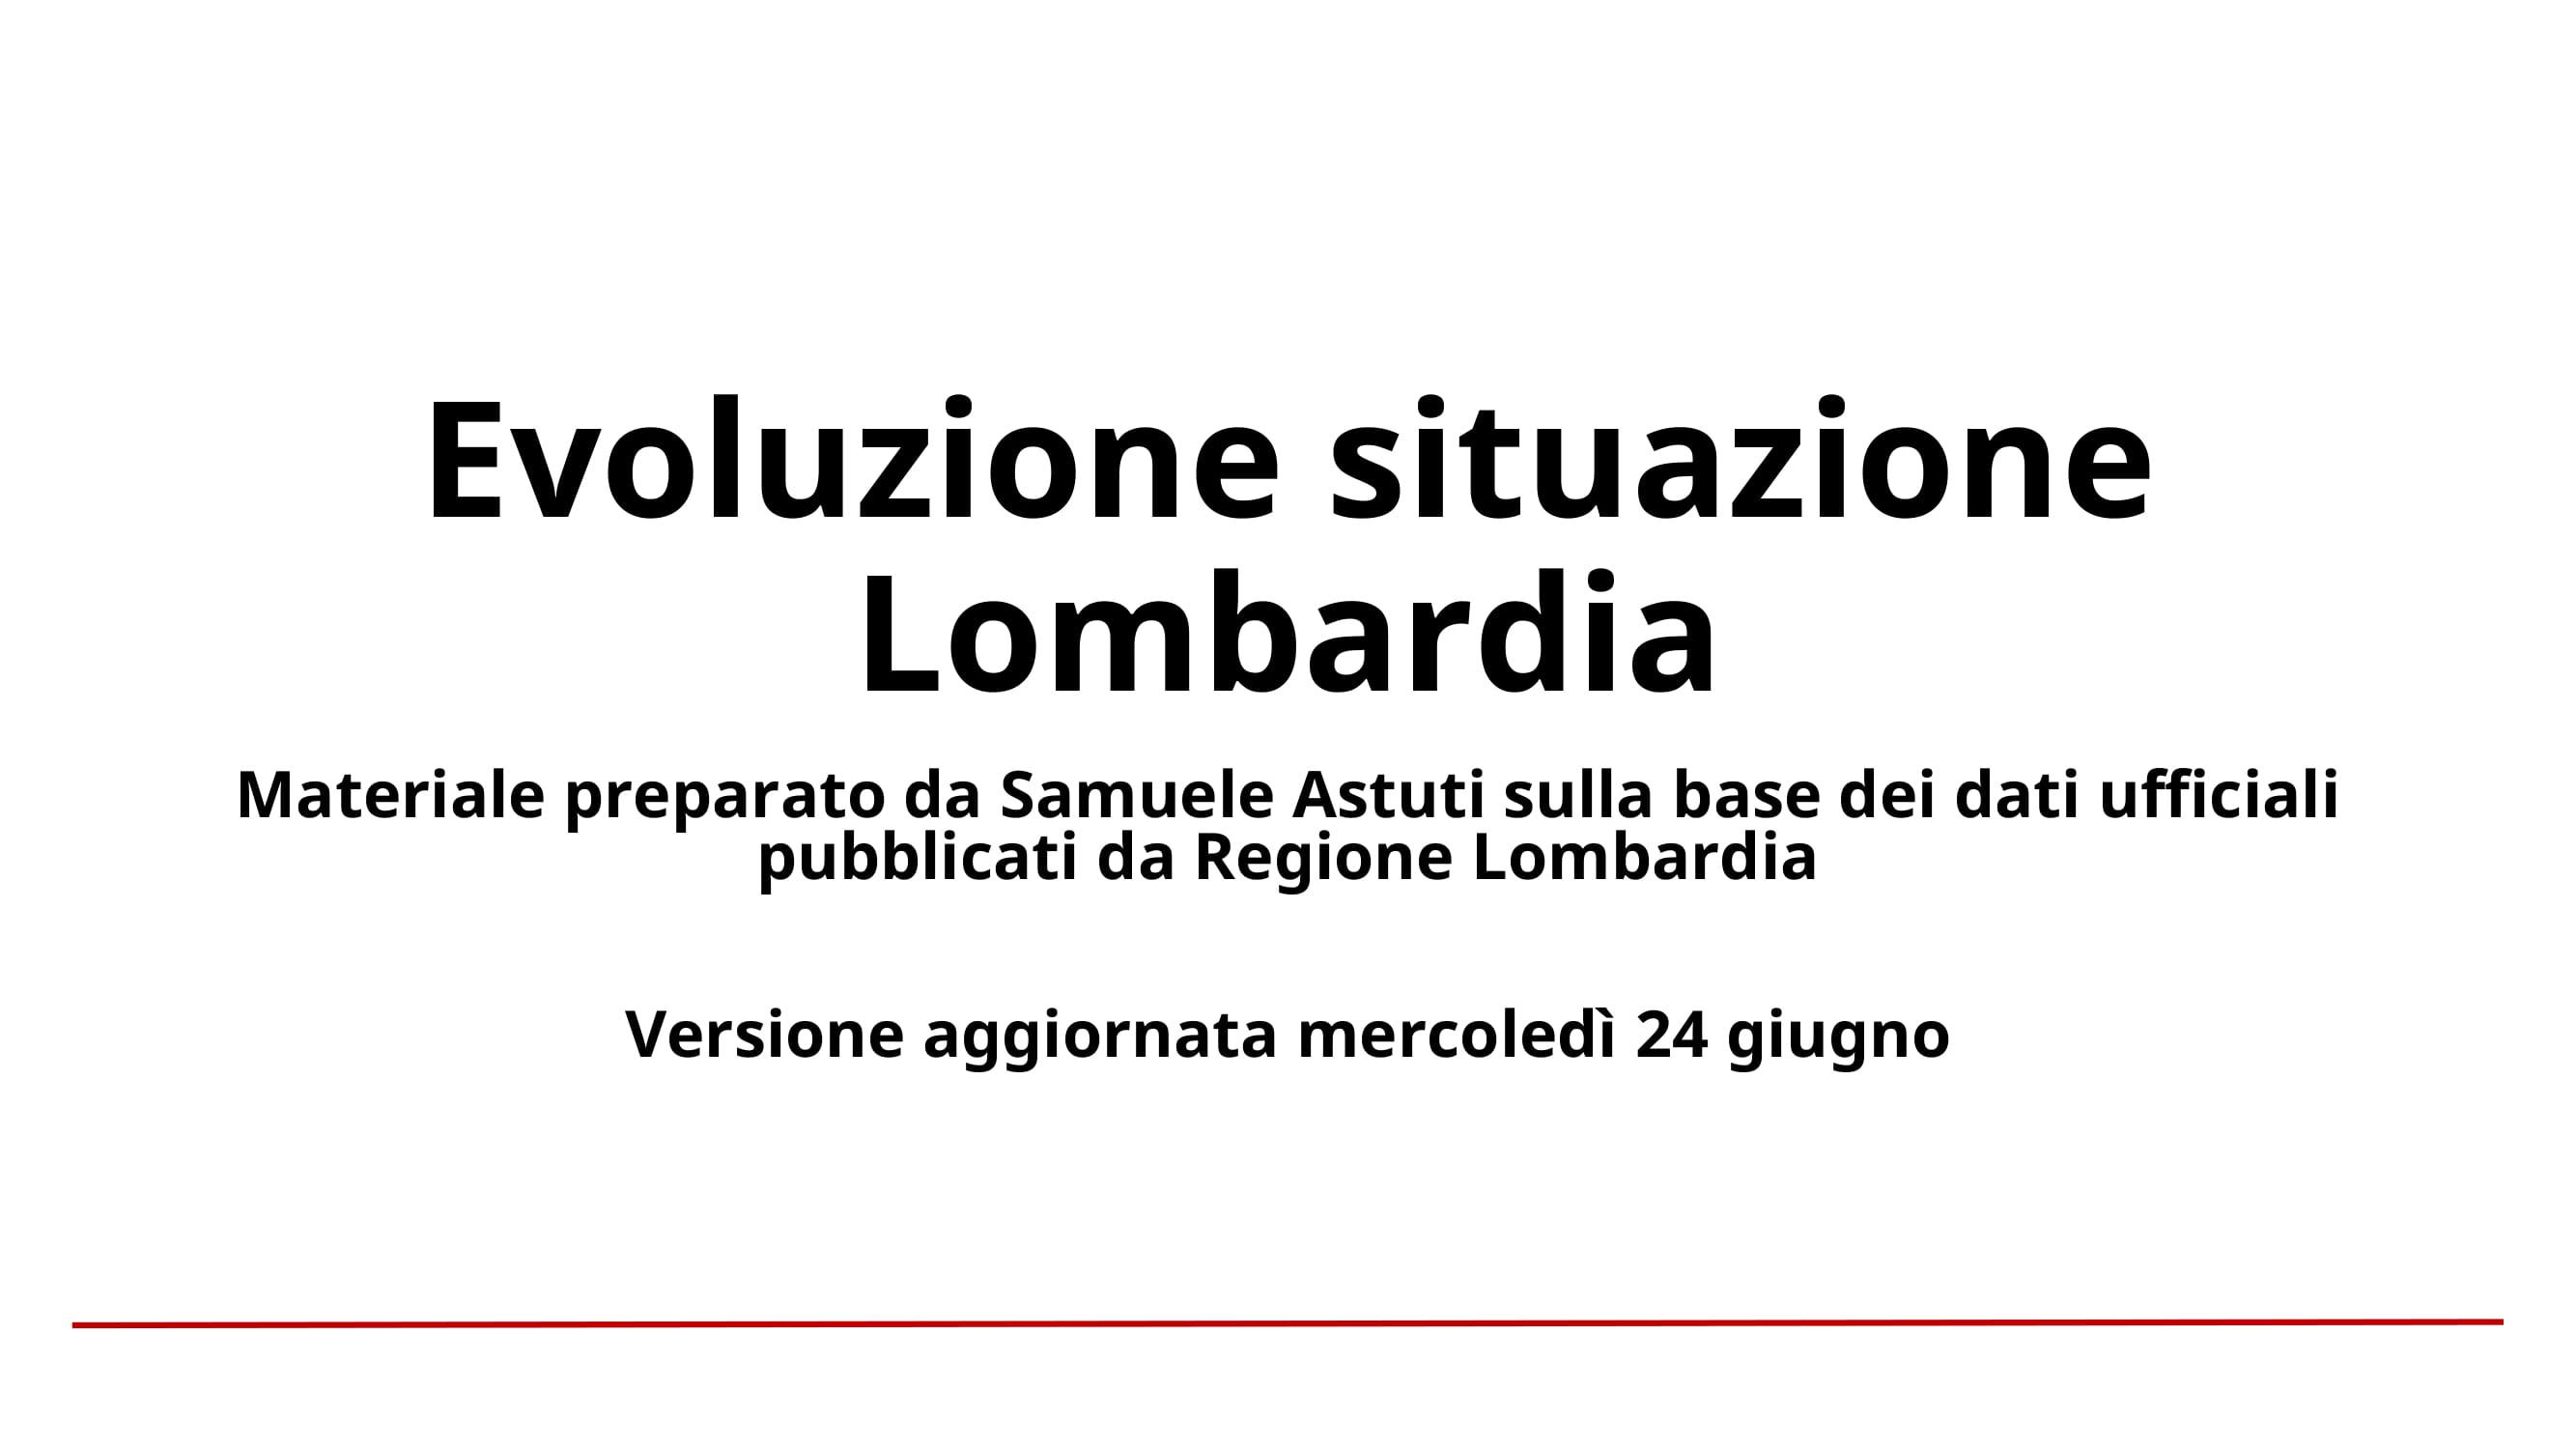 200624-EvoluzioneSituazioneLombardia-01